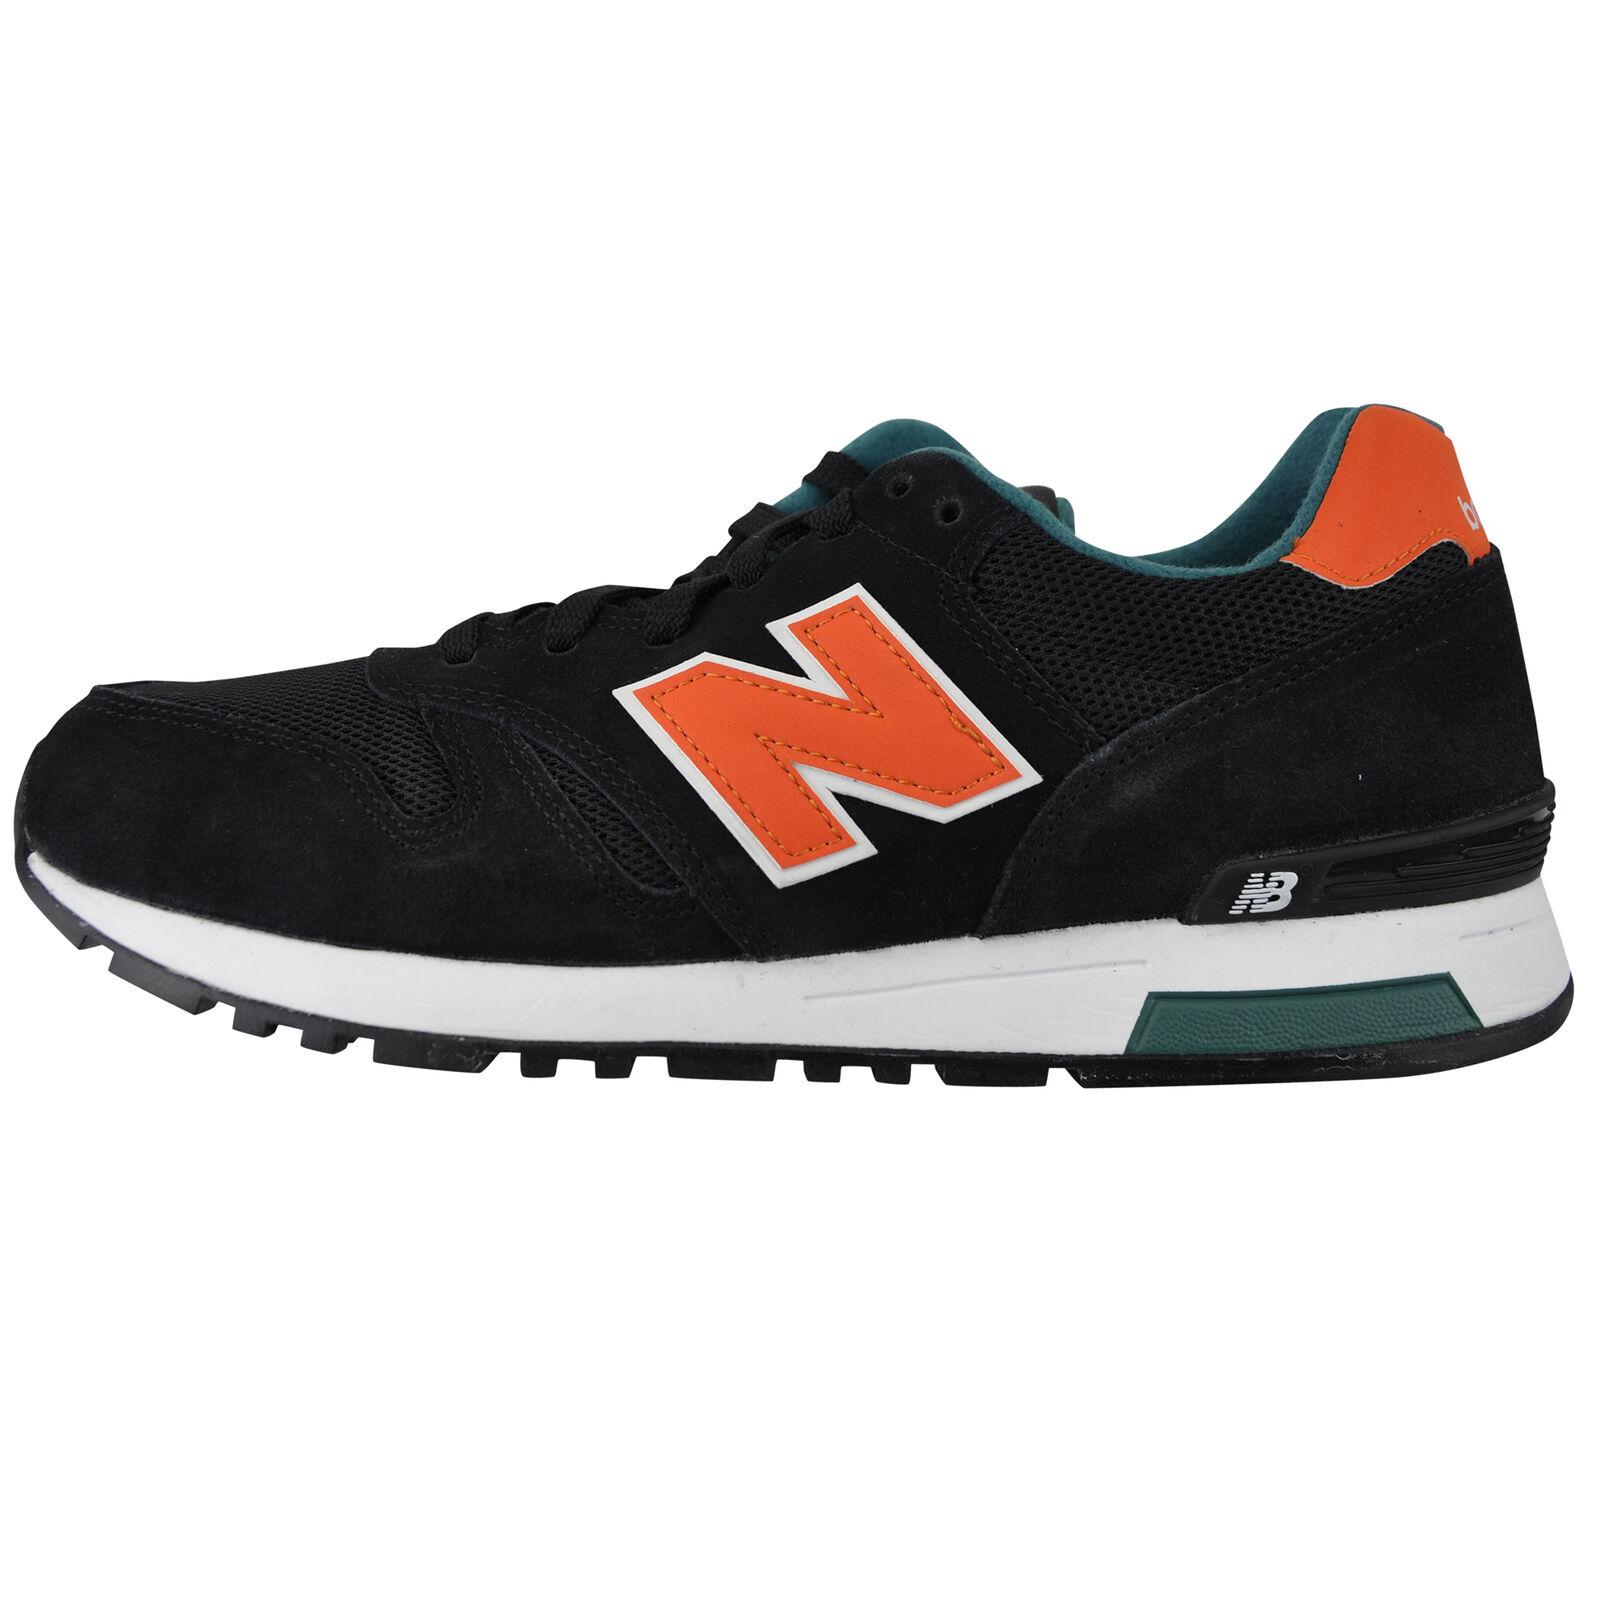 New Balance ML565SBO shoes Hombre Zapatillas de Correr Zapatillas Informales